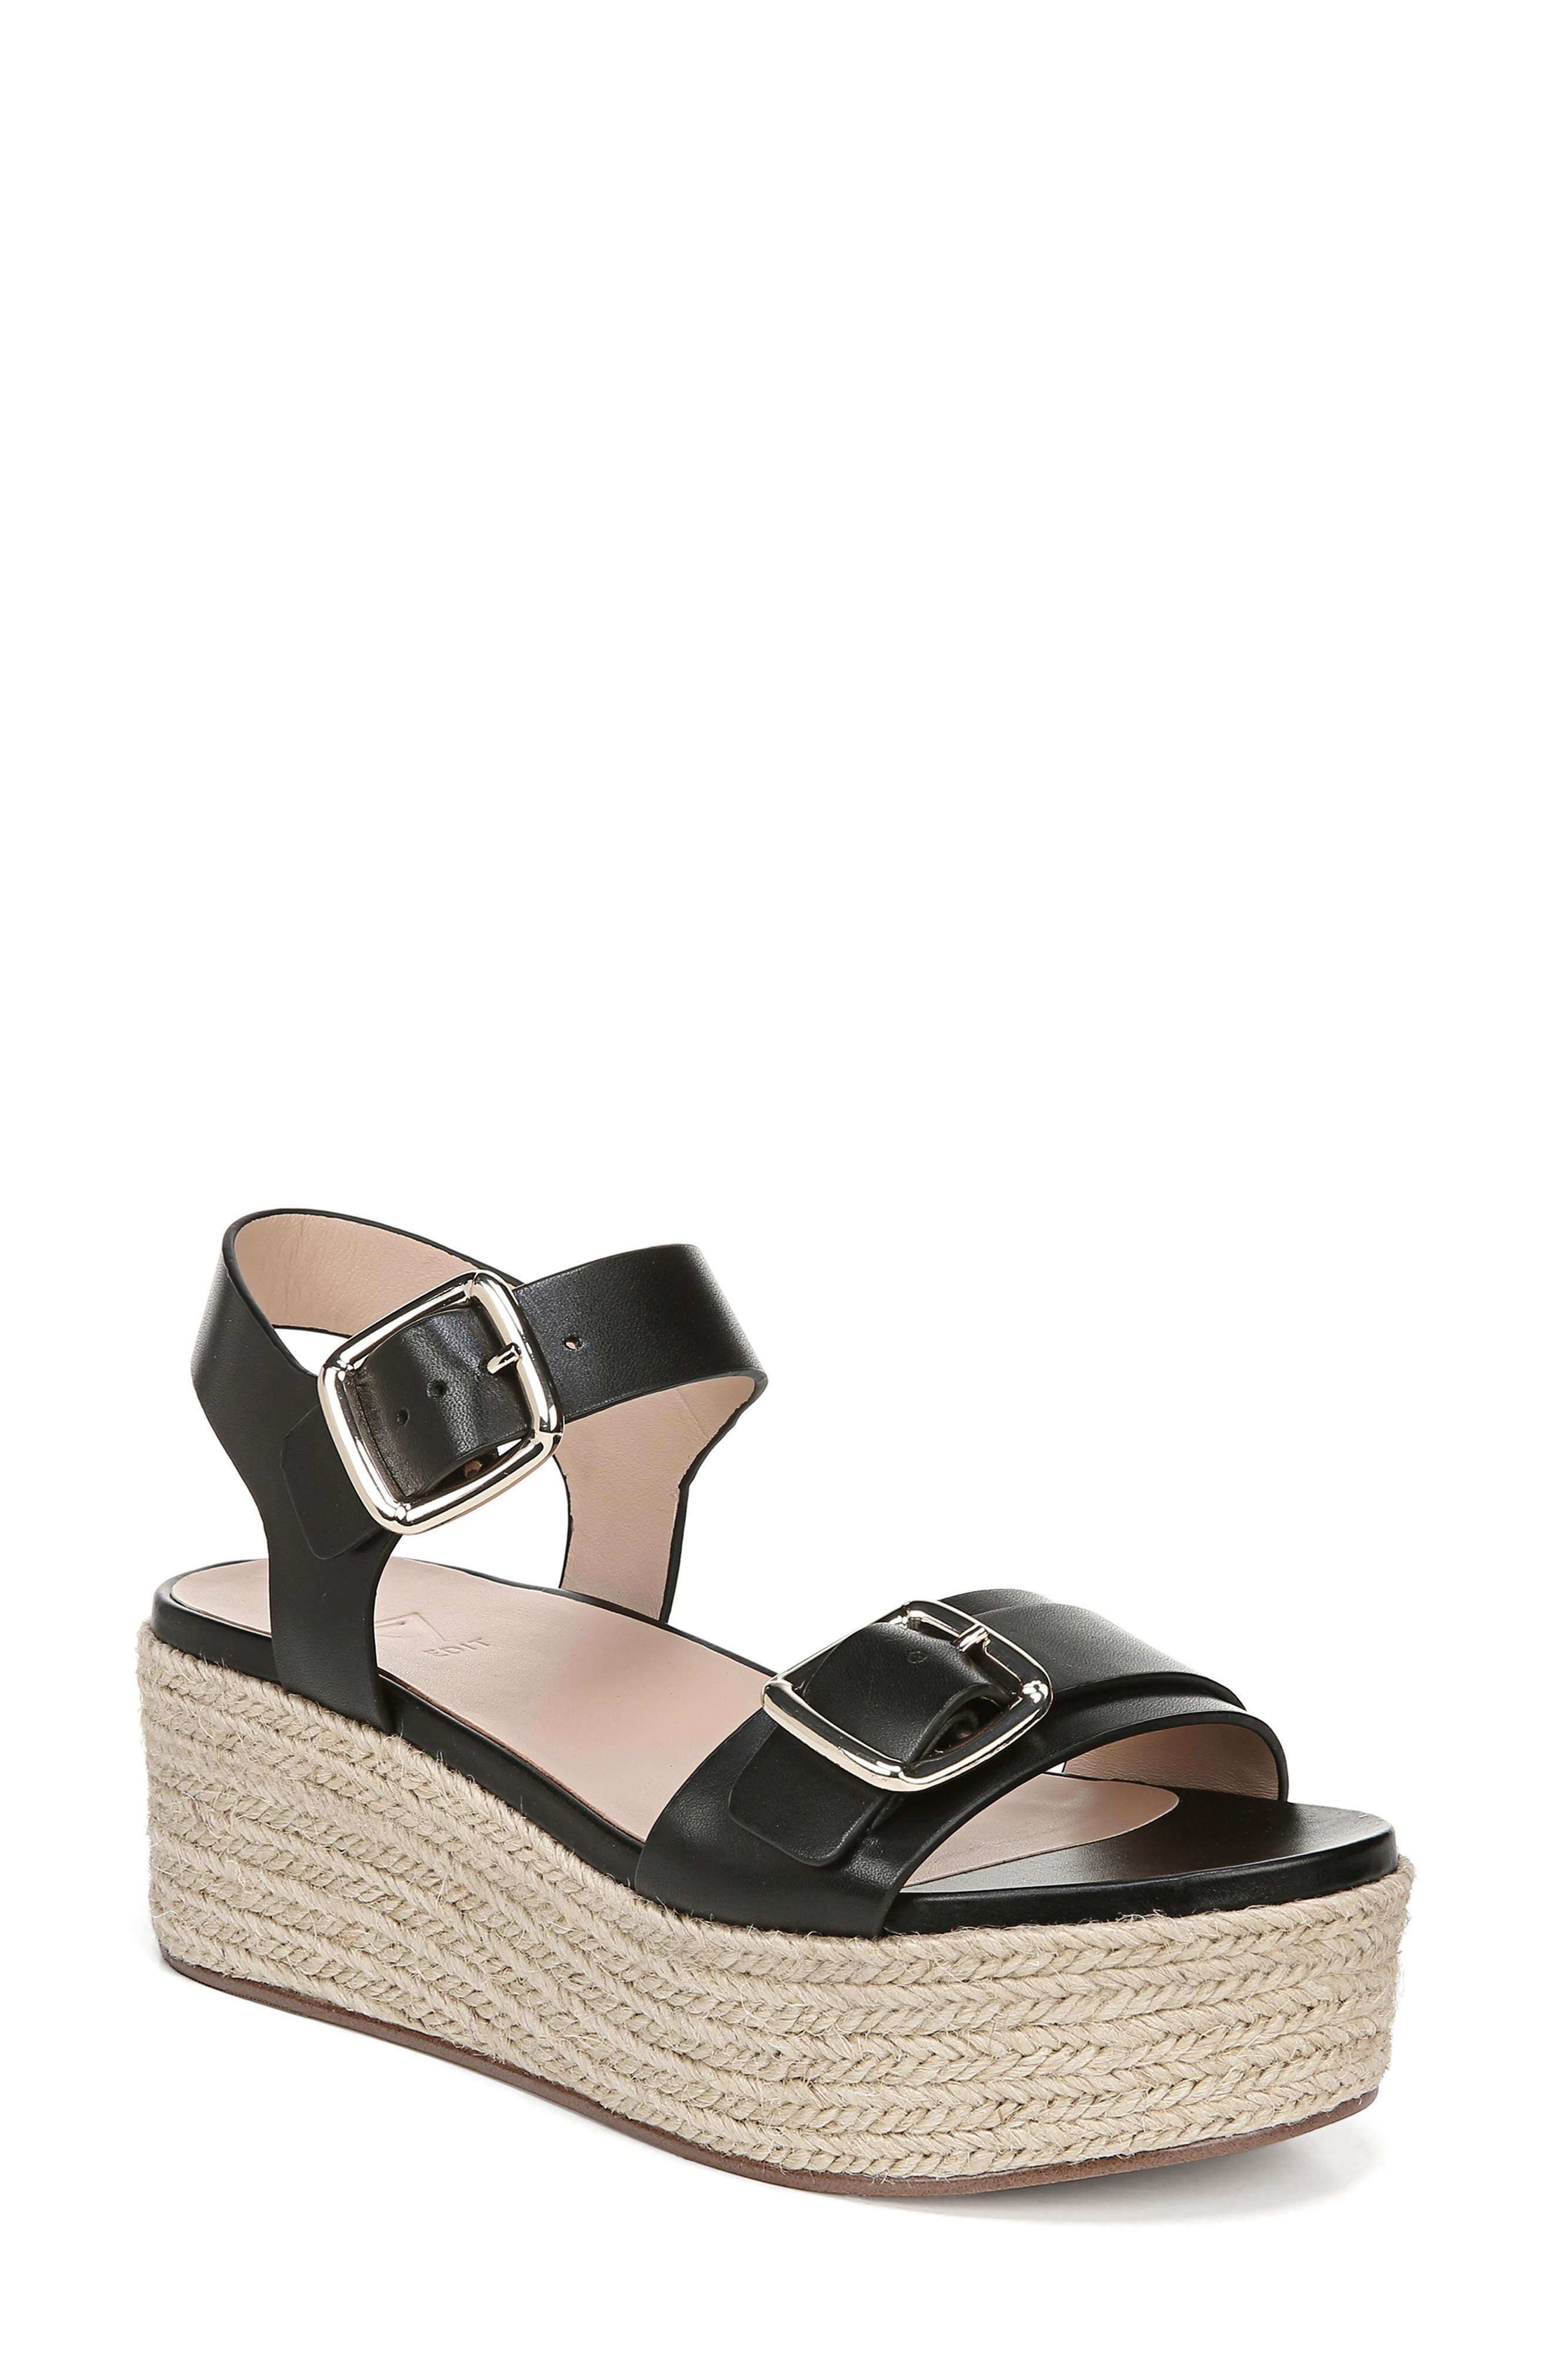 Image of 27 EDIT Jovana Espadrille Platform Sandal - Multiple Widths Available